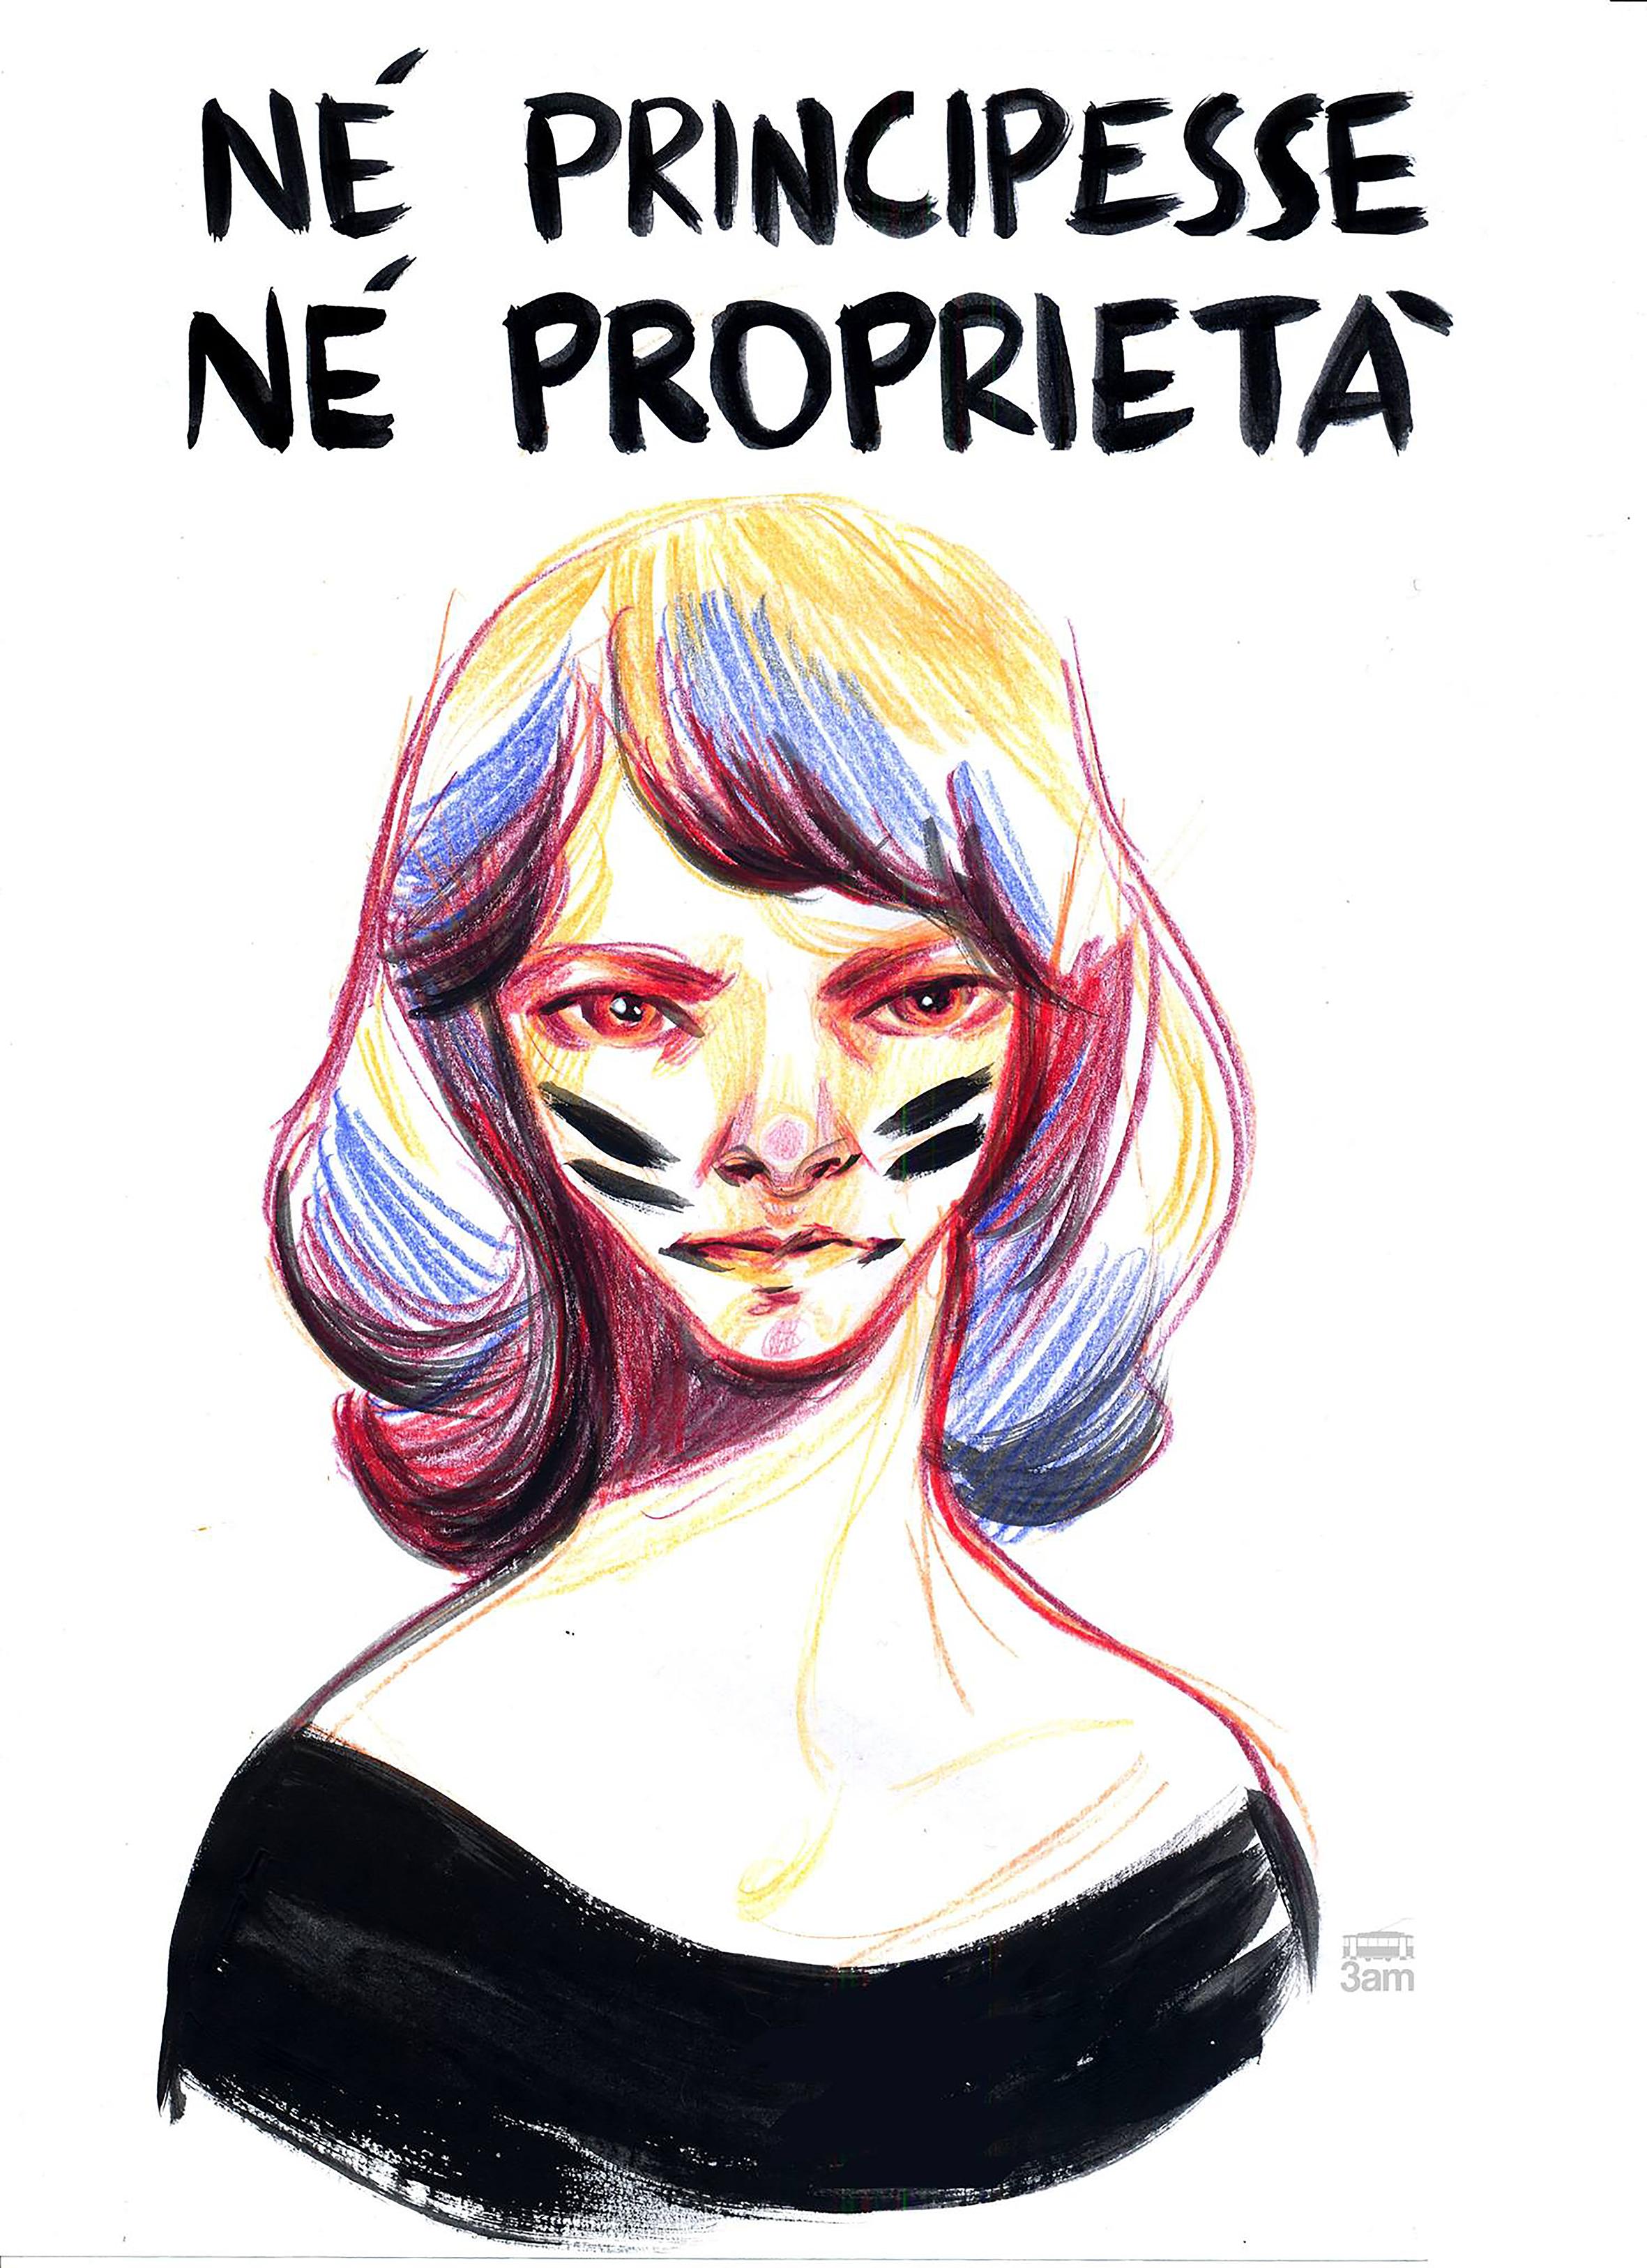 La Tram, Principesse Proprietà